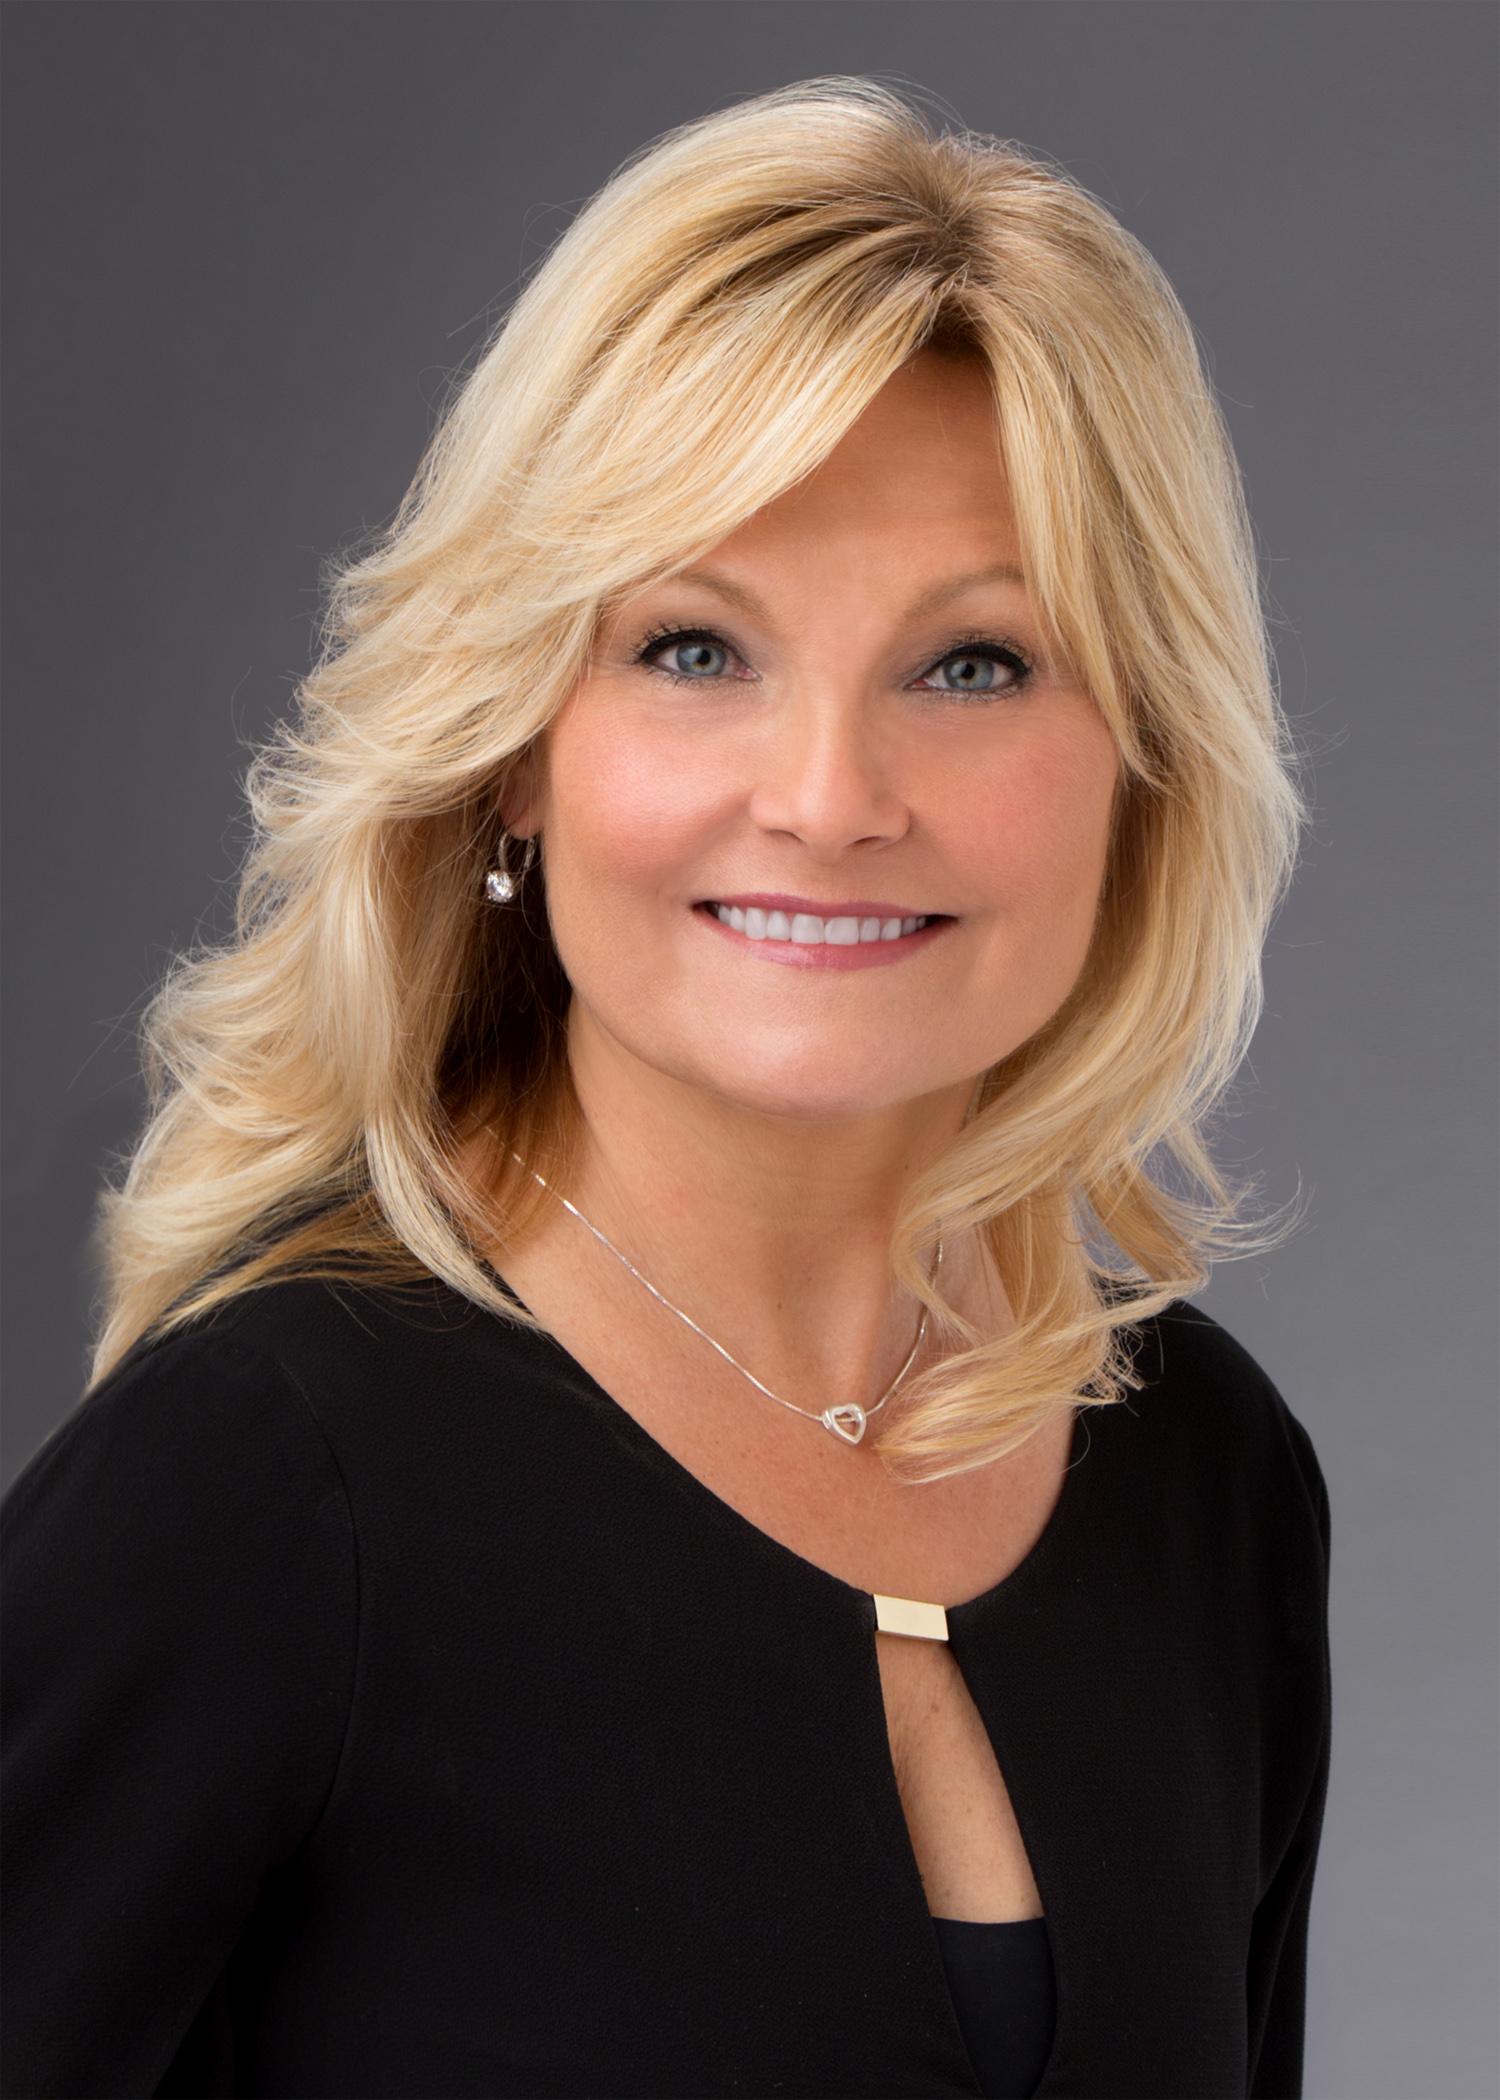 Carolyn Anastasio